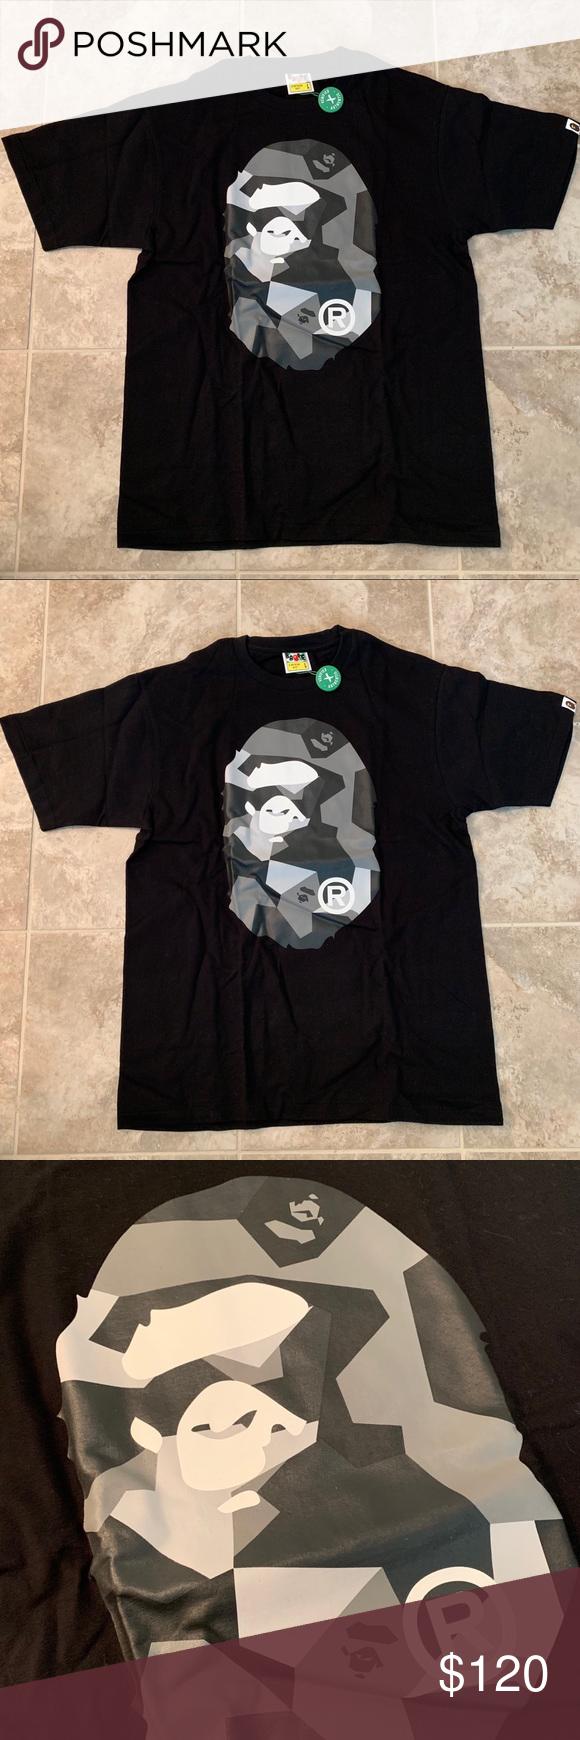 62face4a Bape black tee shirt- sold Black geometric camo print Bape shirt. Size  Large fits